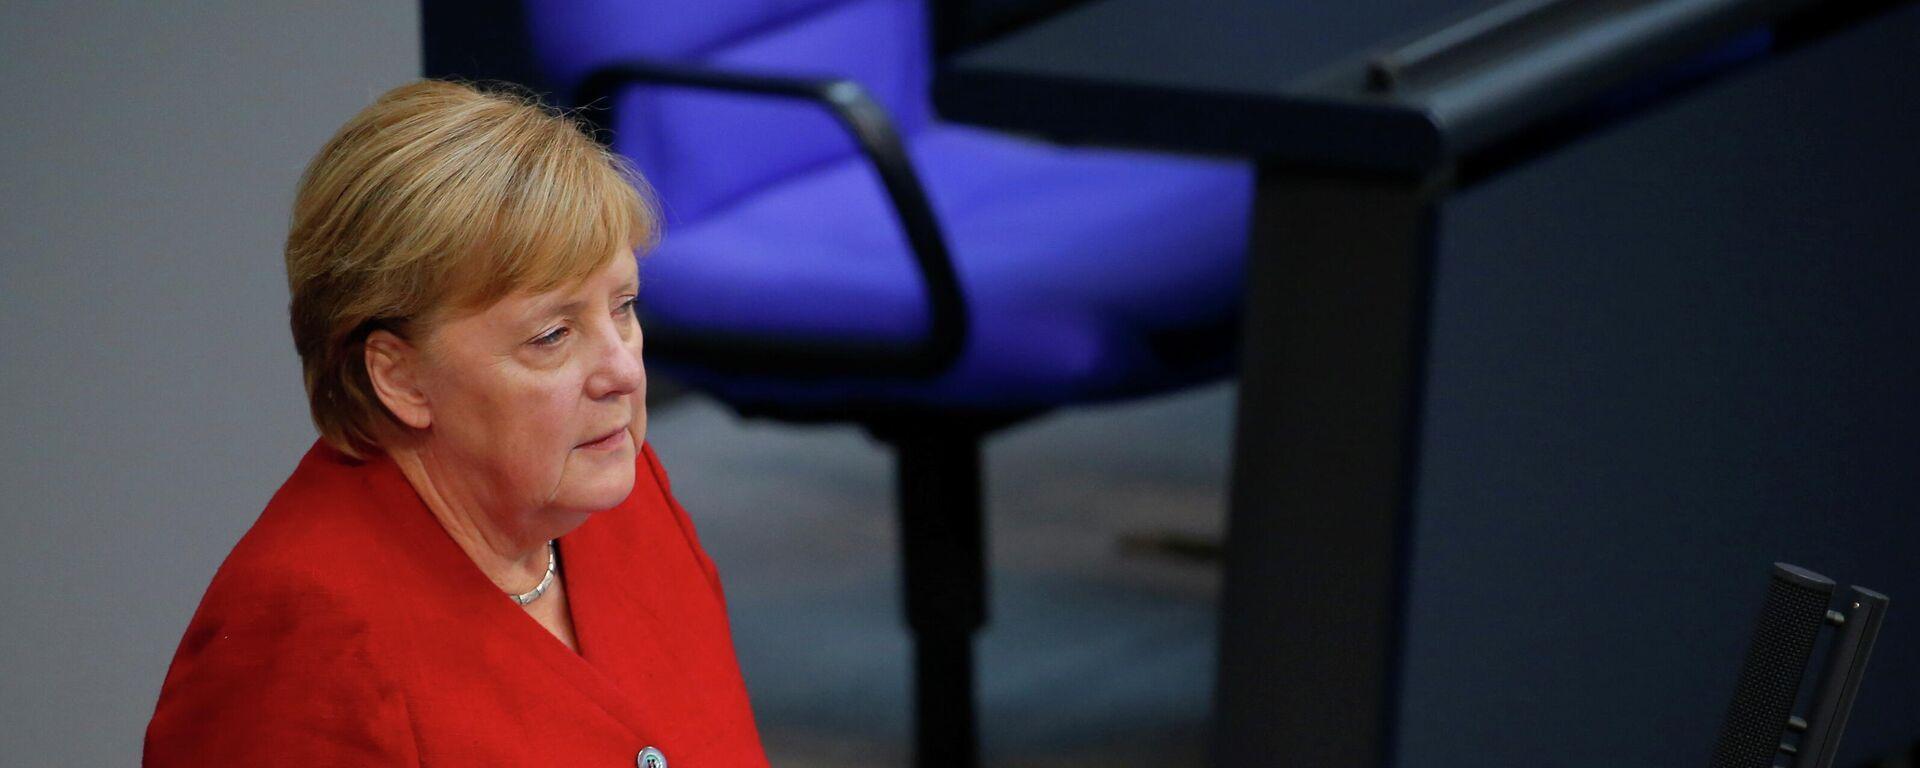 Angela Merkel, canciller alemana,  - Sputnik Mundo, 1920, 25.08.2021